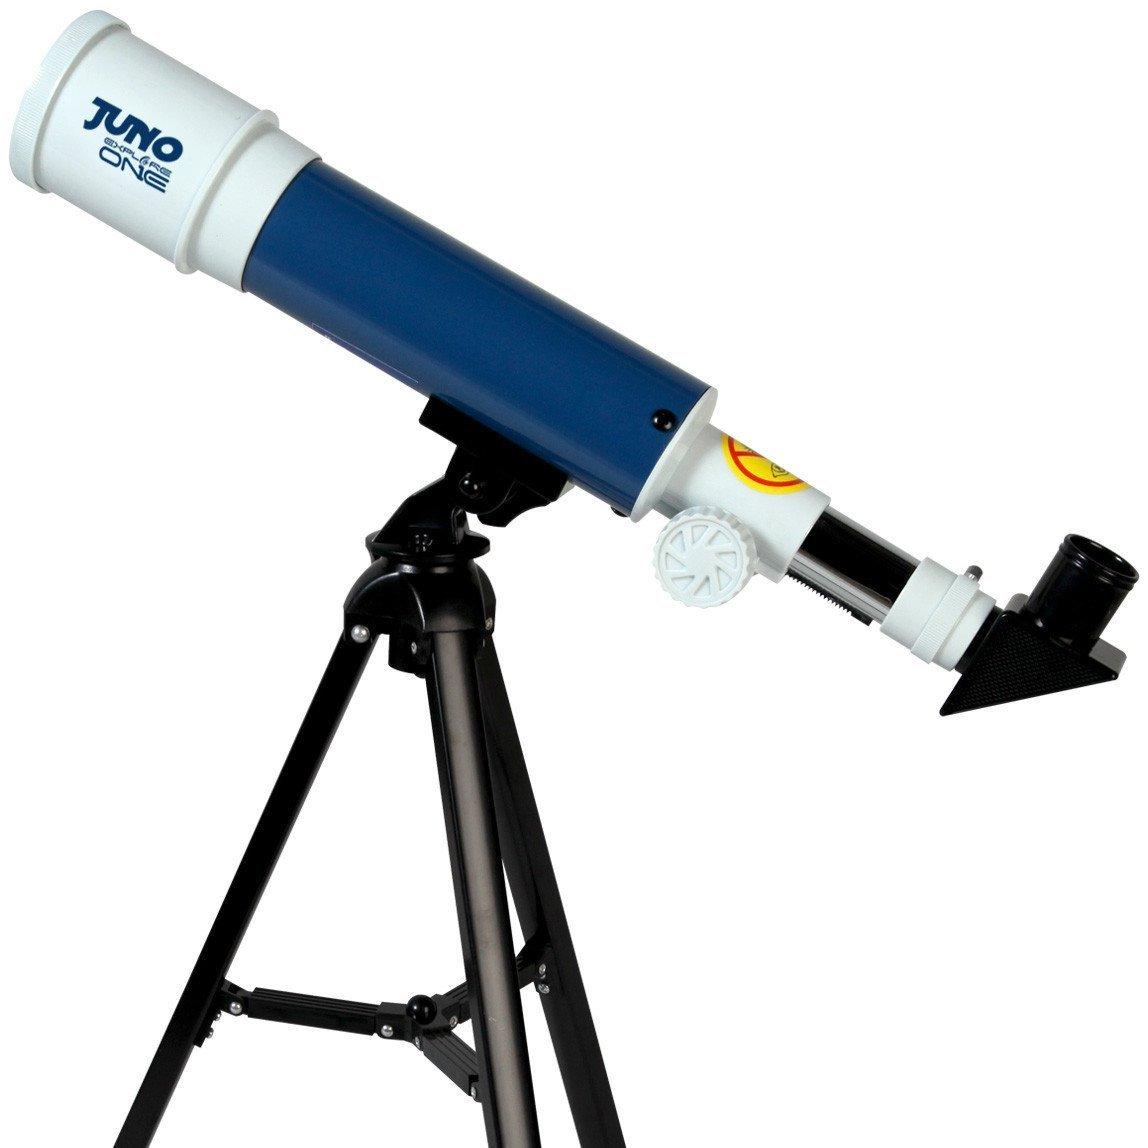 ExploreOne Kids Educational Telescope, 50mm Apeture Astronomy Refracter Telescope 360mm AZ Mount, Travel Scope with Tripod, Portable Telescope Gift for Kids Educational &Beginners